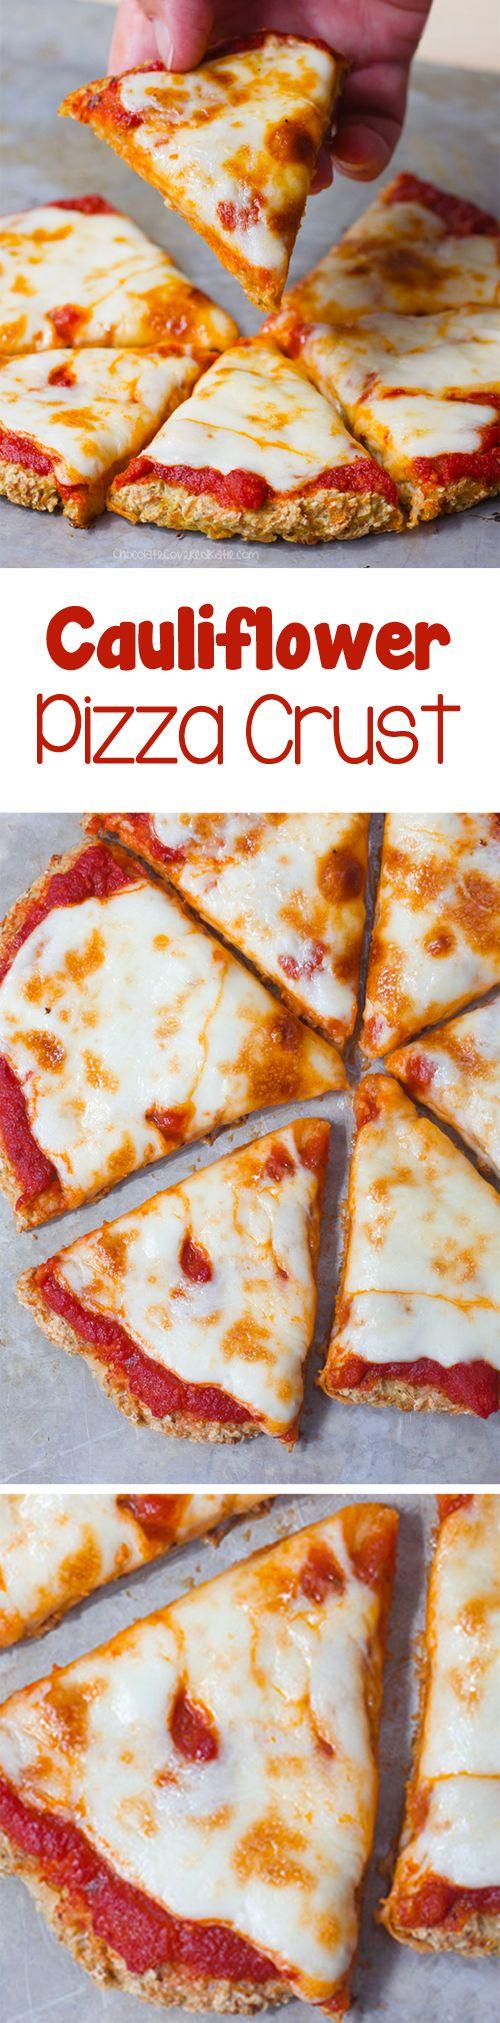 Cauliflower Pizza Crust - Ingredients: 1 cauliflower, 1/4 cup water, 1 tsp oregano, 2 tbsp... full cauliflower pizza crust recipe is on the blog